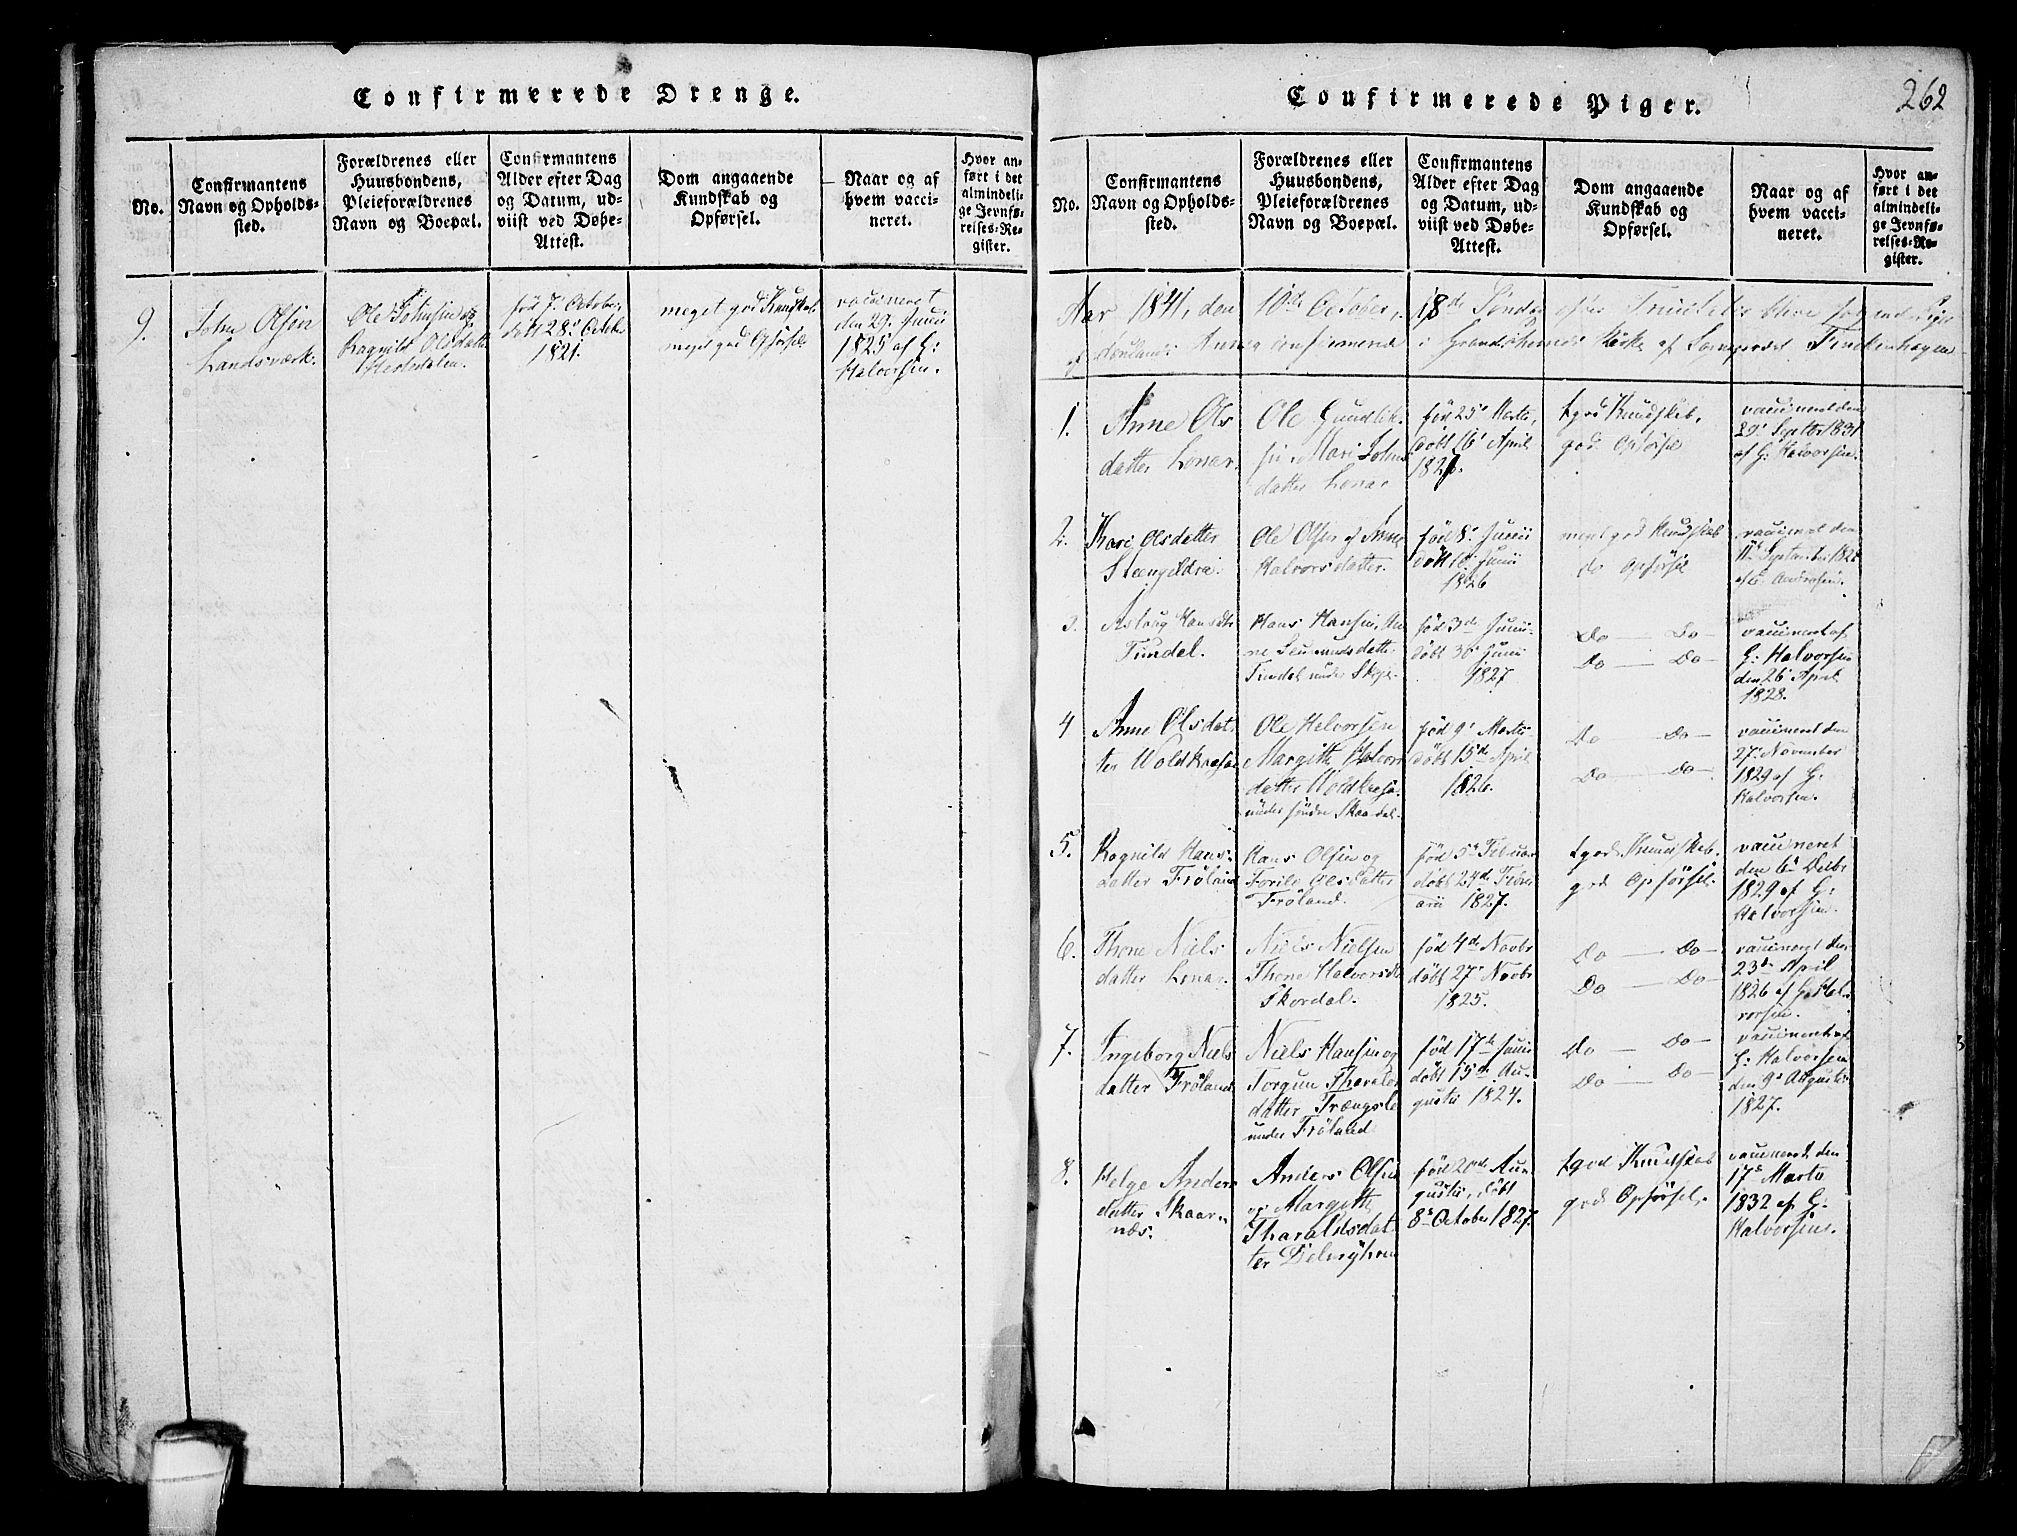 SAKO, Hjartdal kirkebøker, F/Fb/L0001: Ministerialbok nr. II 1, 1815-1843, s. 262